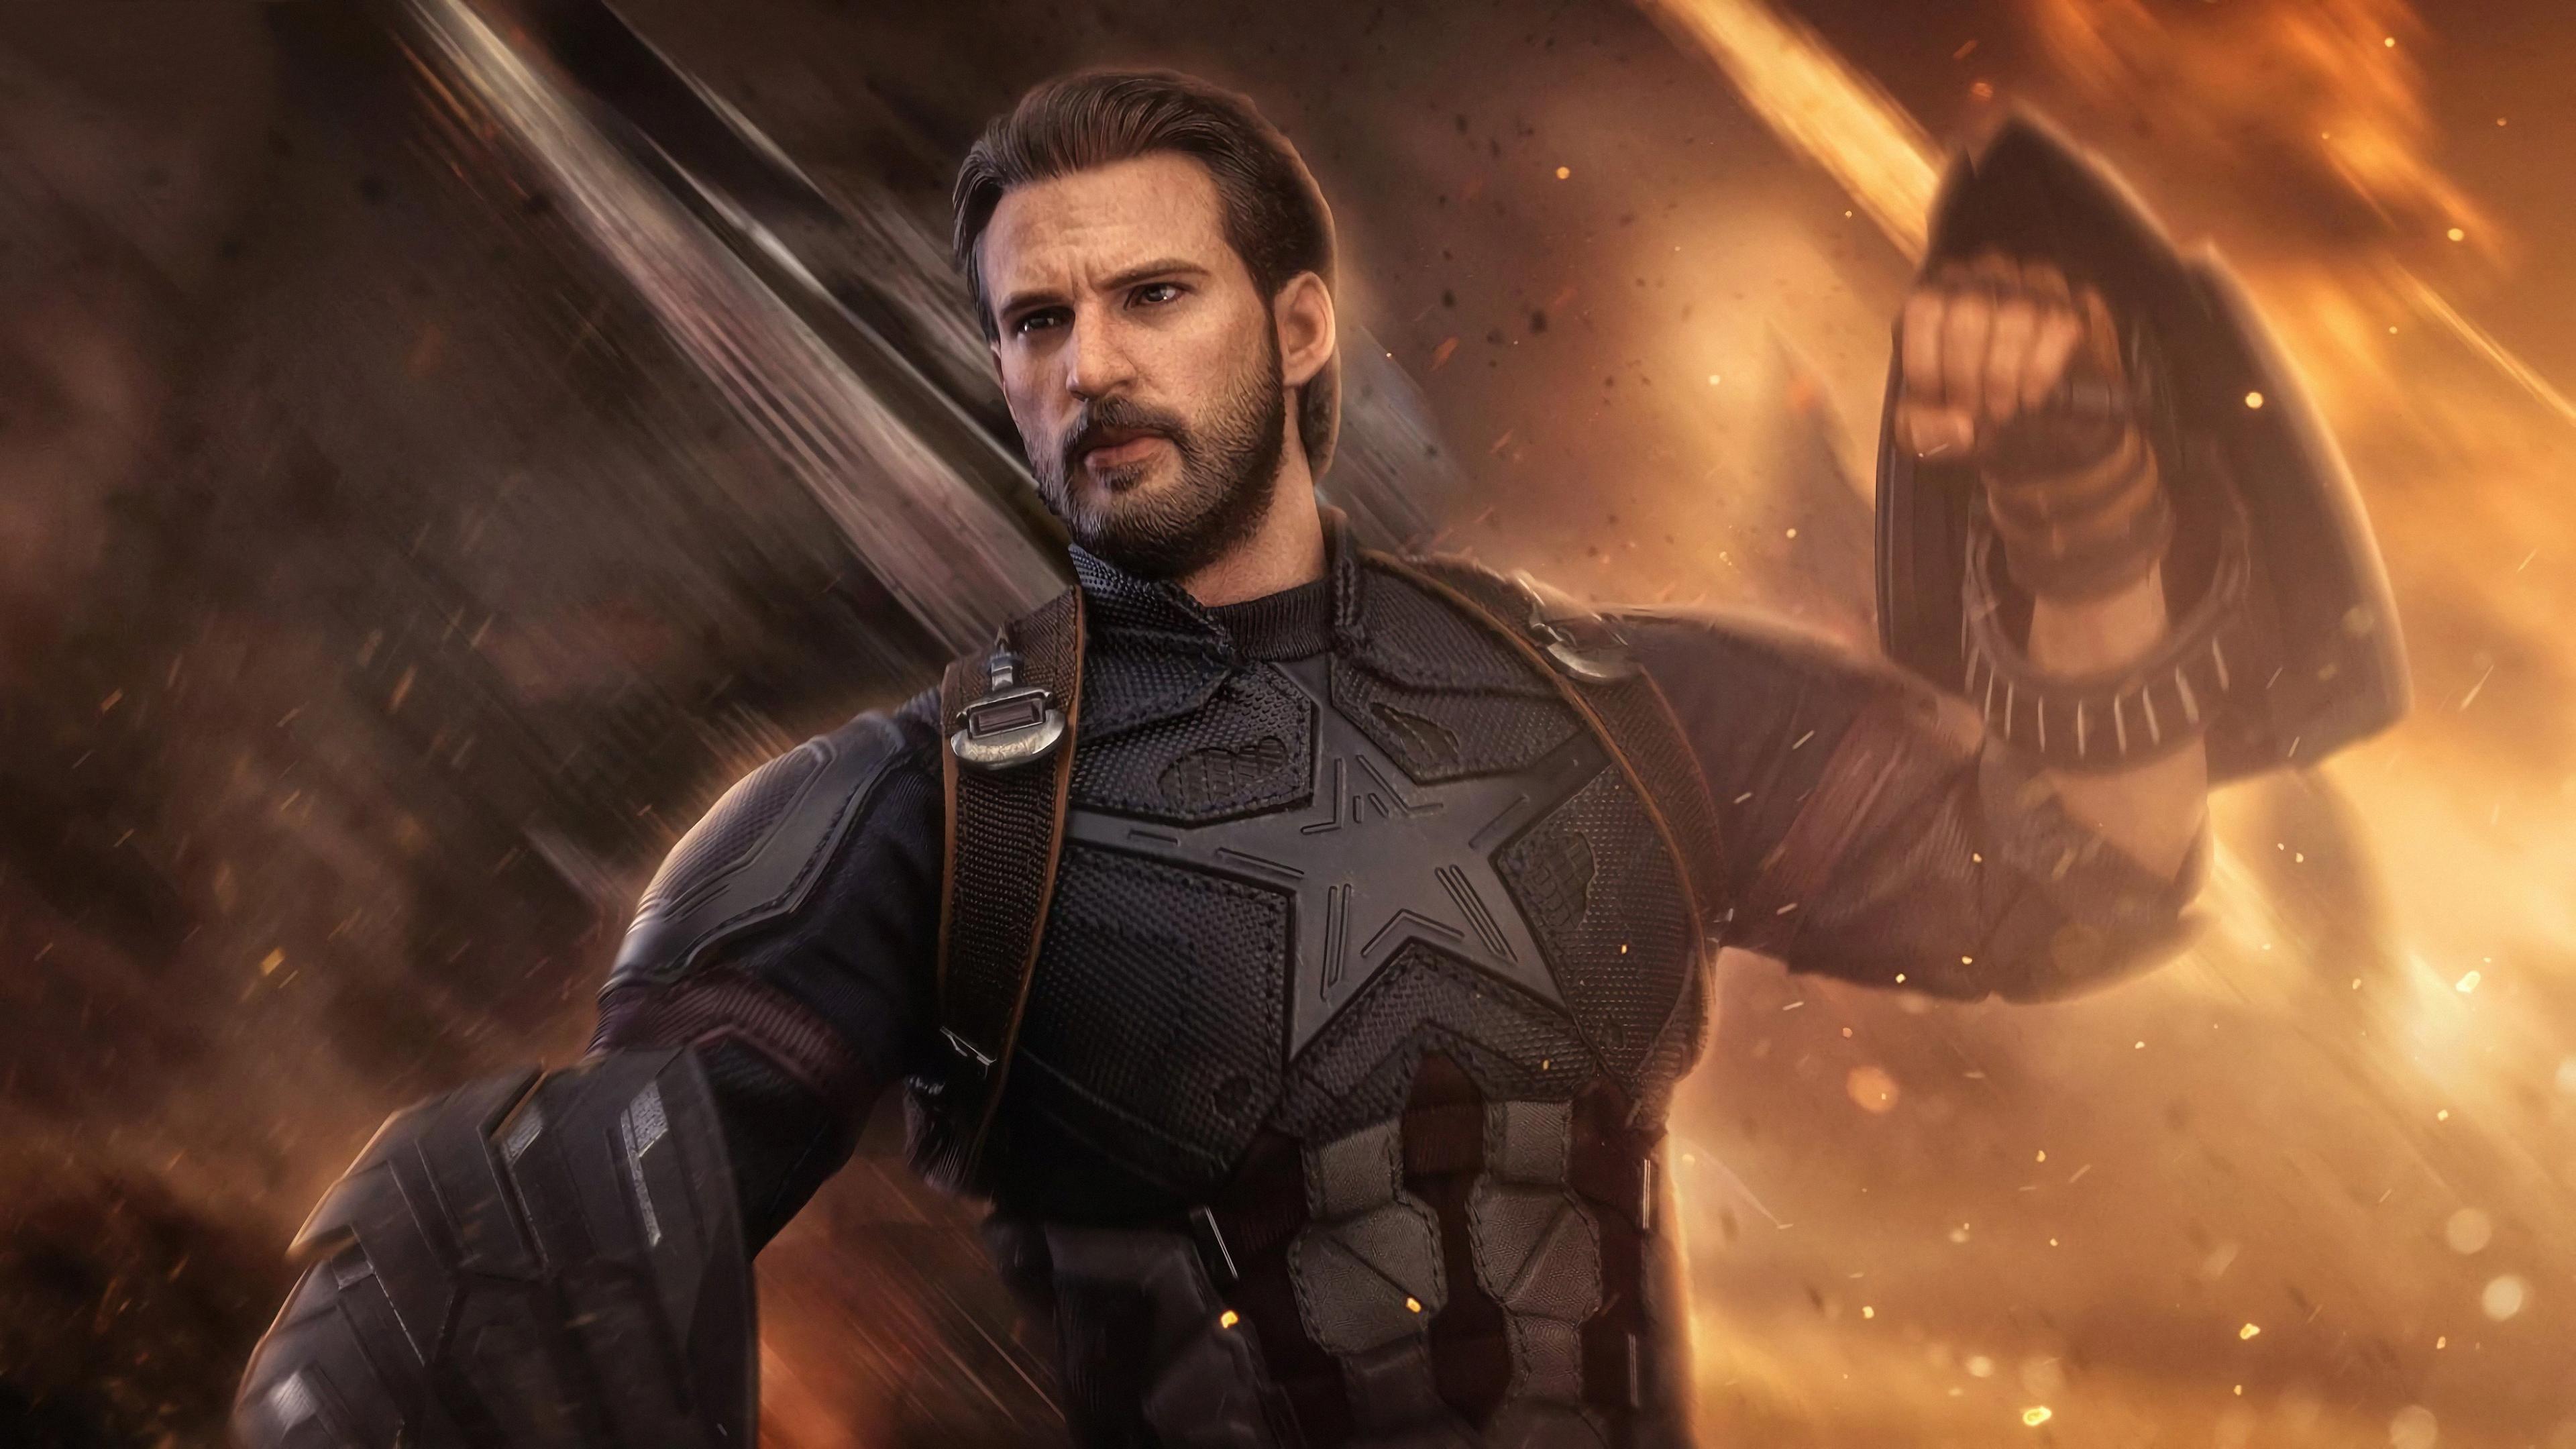 captain america avengers 1568055247 - Captain America Avengers - superheroes wallpapers, hd-wallpapers, captain america wallpapers, artwork wallpapers, 4k-wallpapers